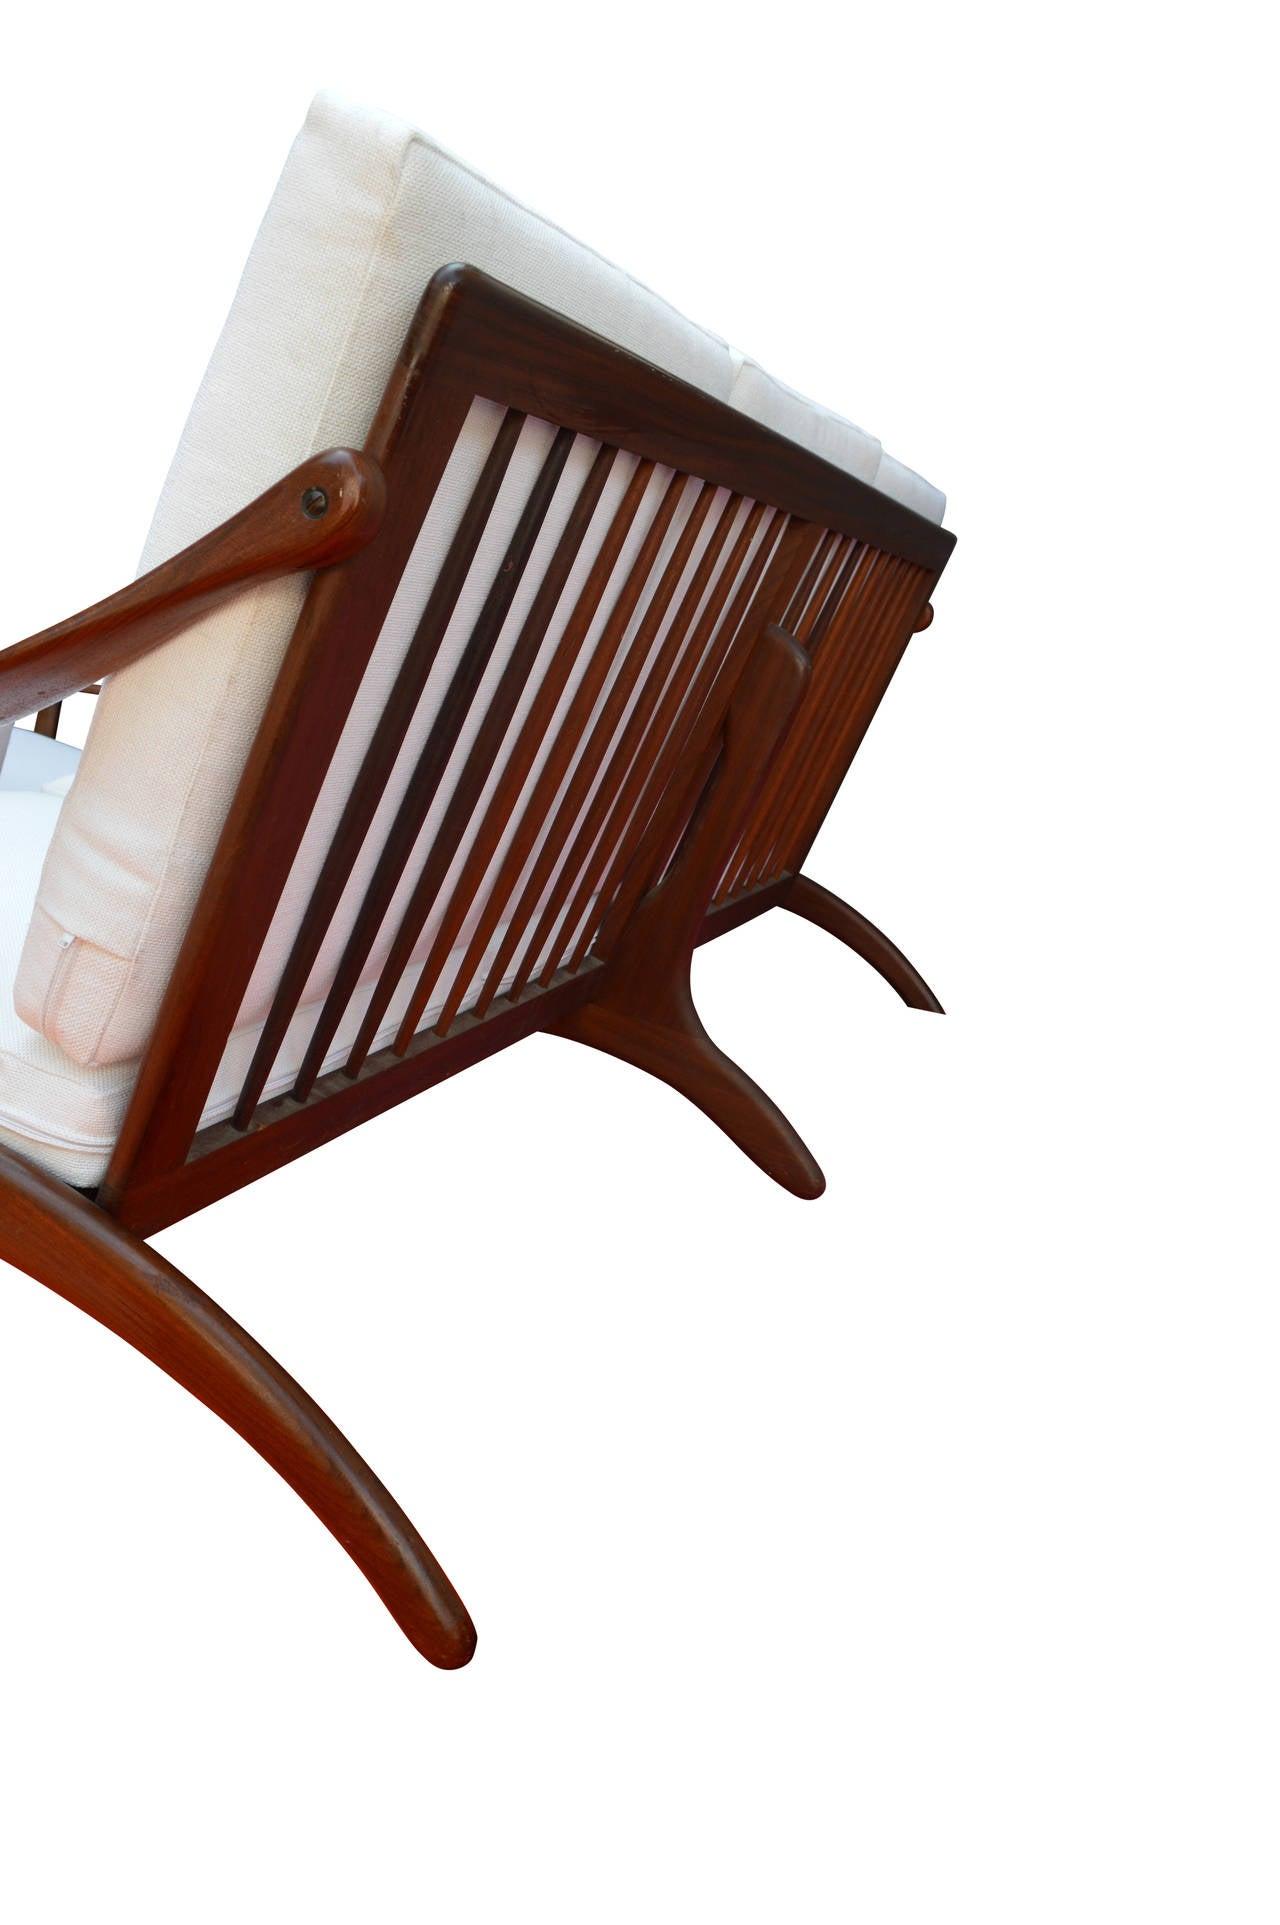 Danish Mid-Century Sofa by Arne Hovmand Olesen